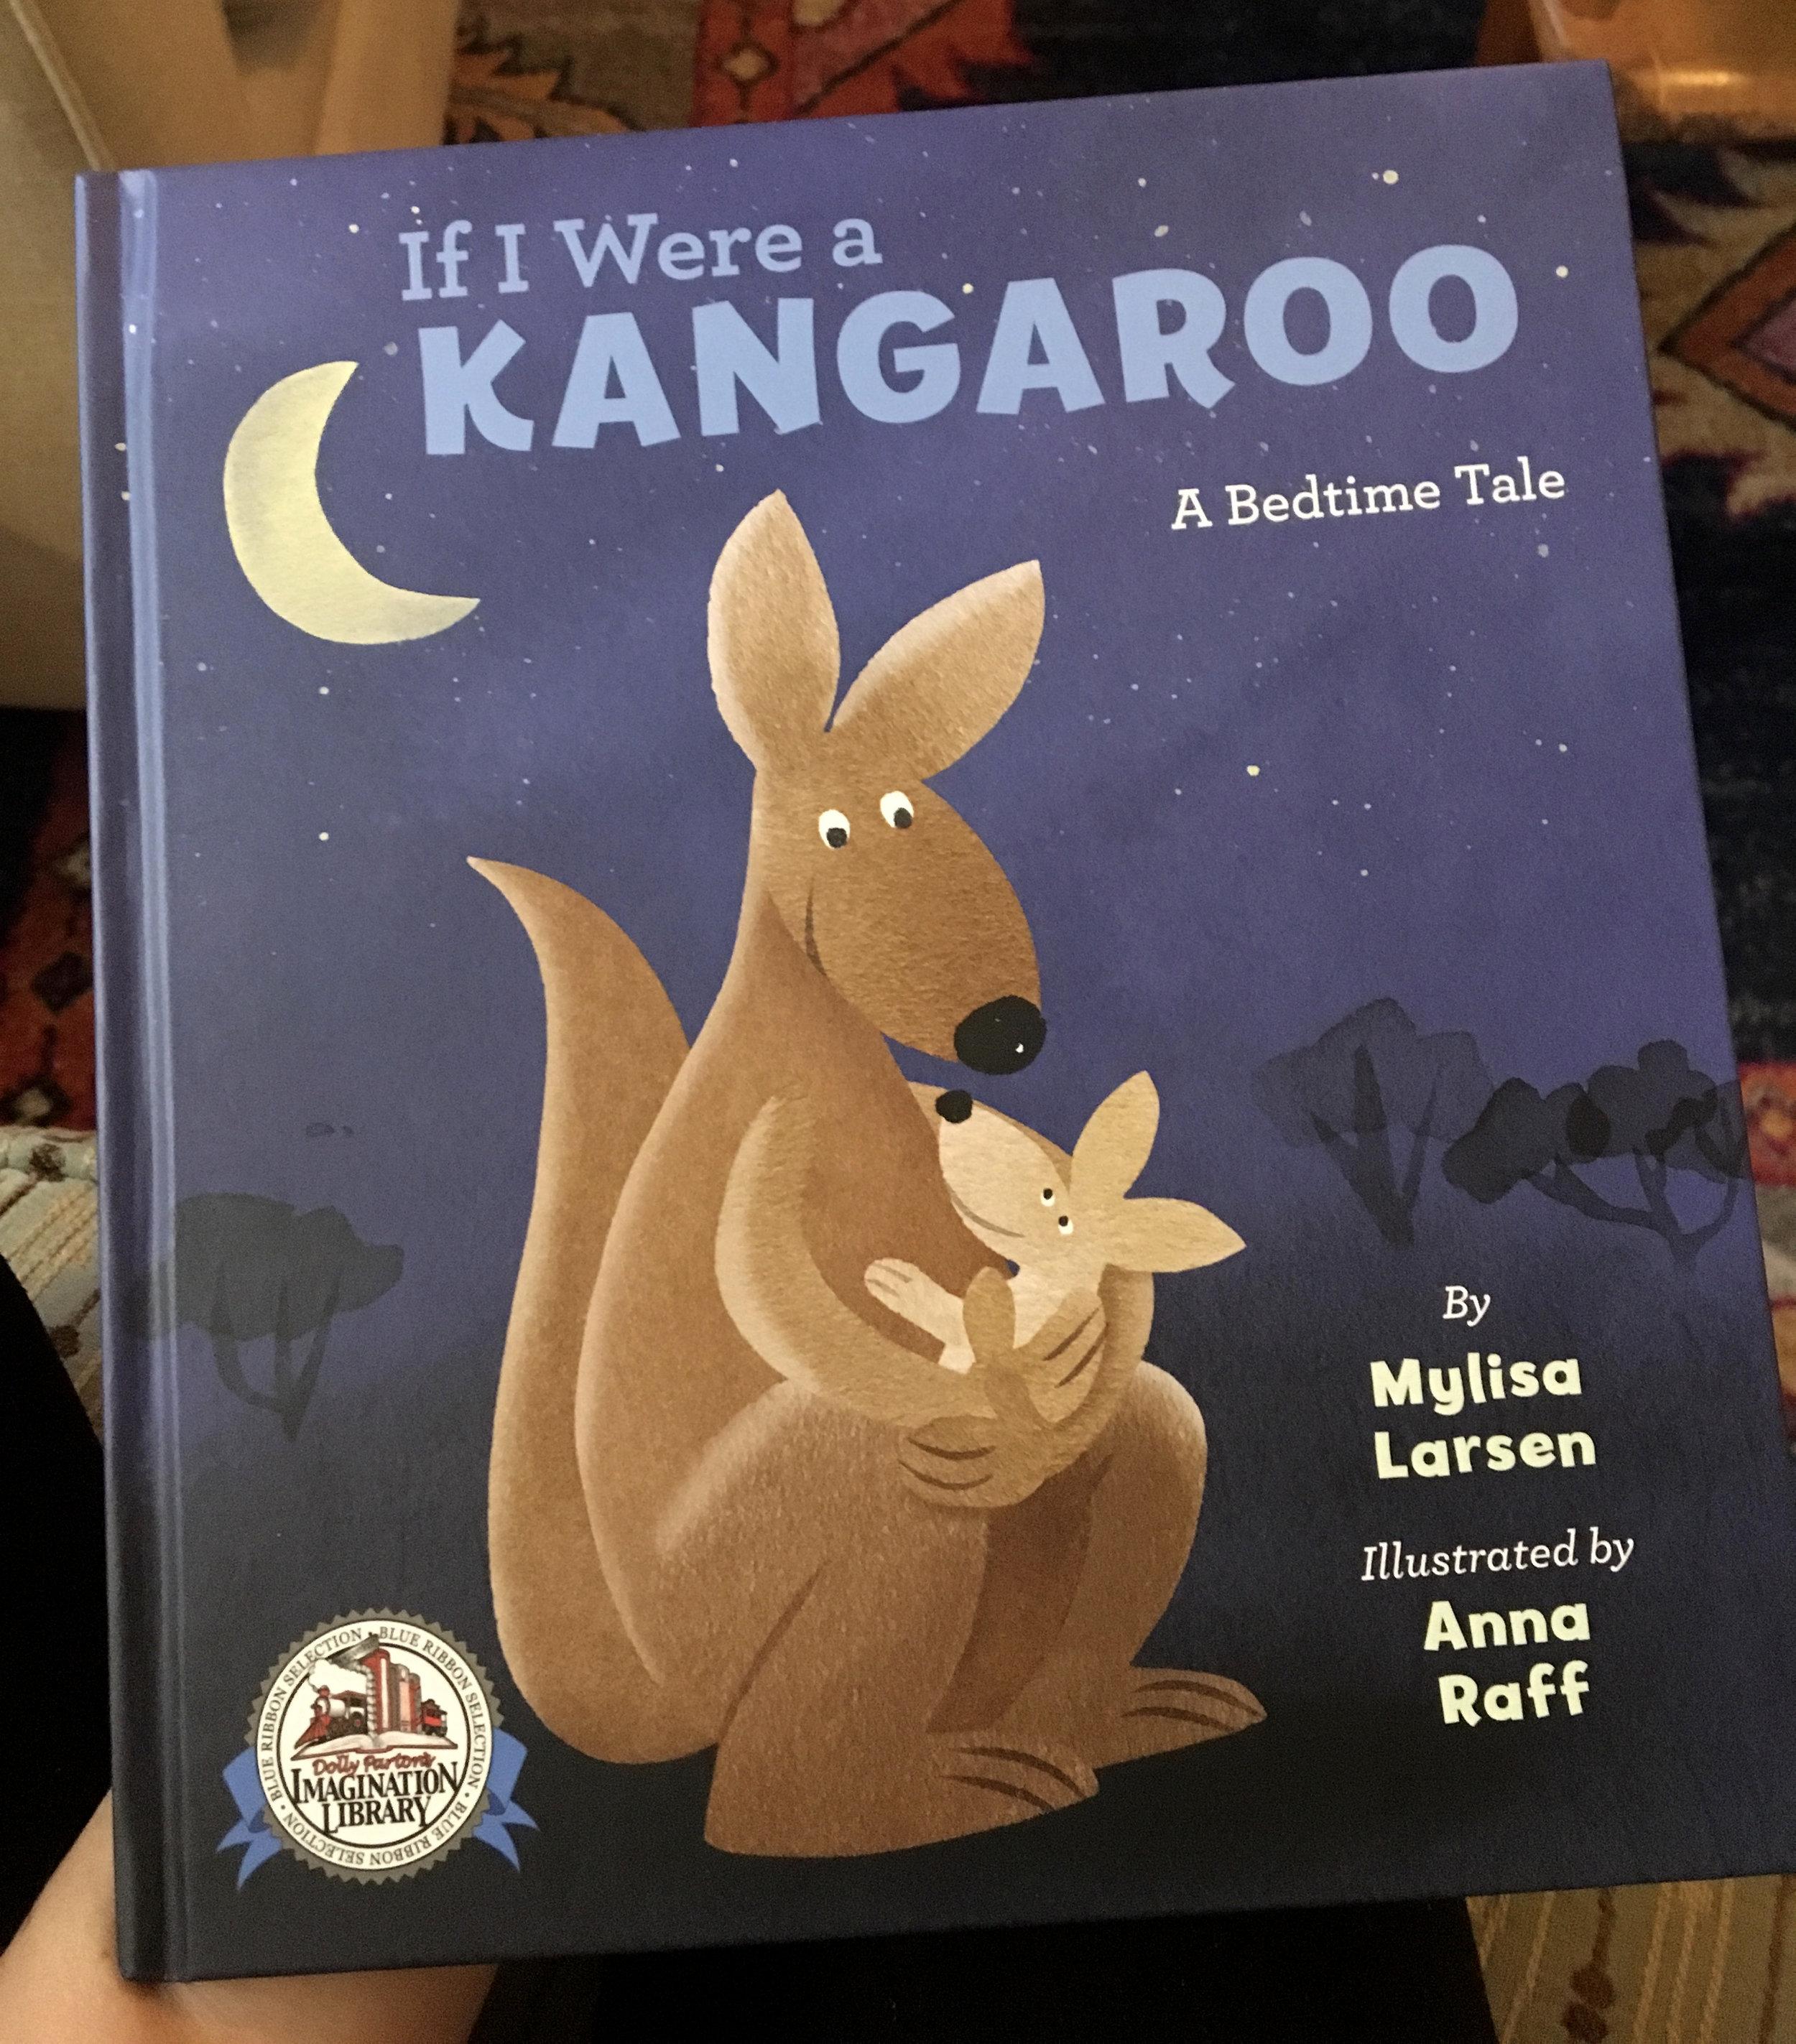 ARaff_Kangaroo-DollyParton1.jpg